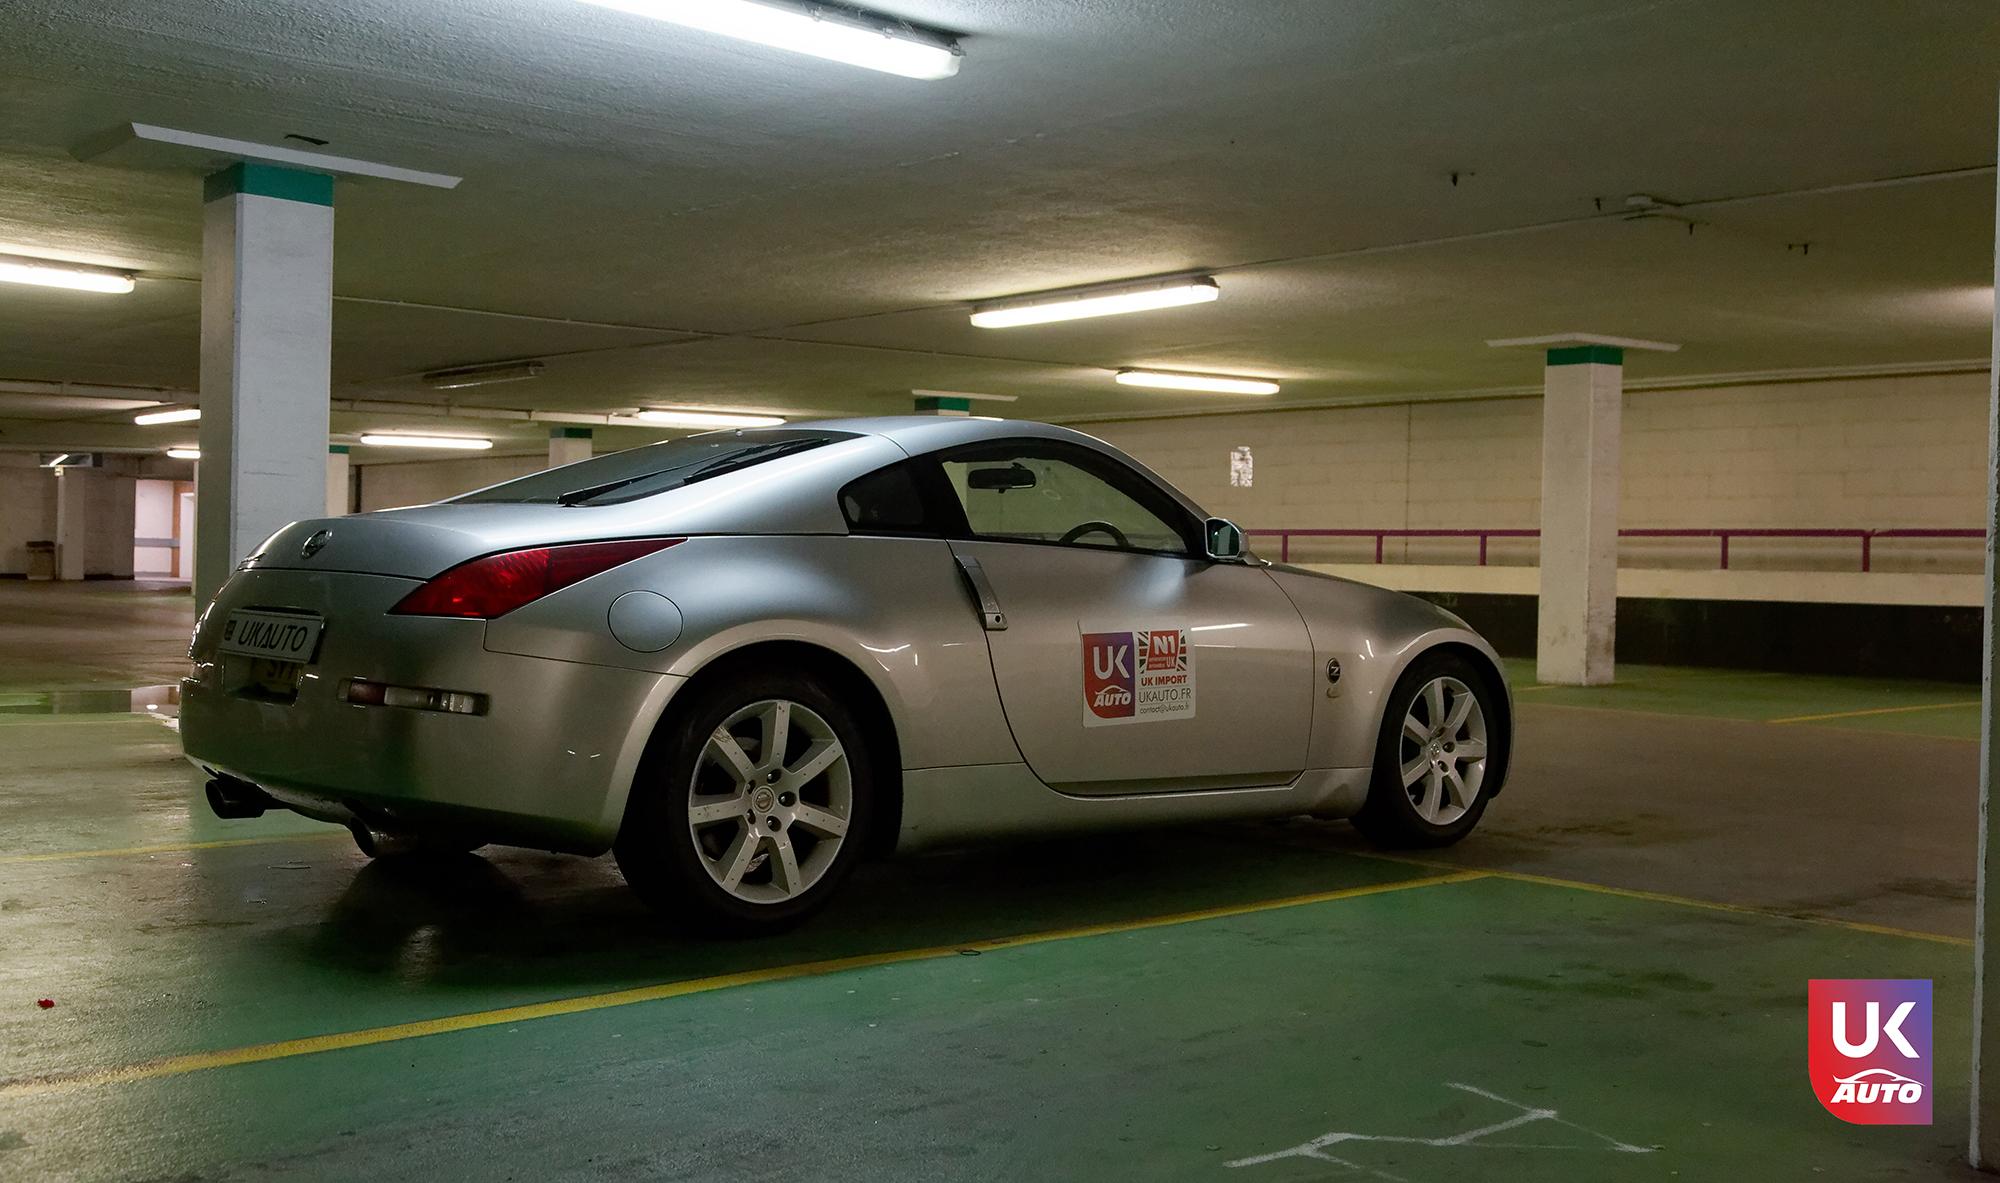 Ukauto import nissan 350z jdm import fairlady v6 import uk ukauto rhd nissan import uk5 - Import Nissan 350Z JDM IMPORT 3.5 V6 TIPTRONIC IMPORT AUTO par UKAUTO